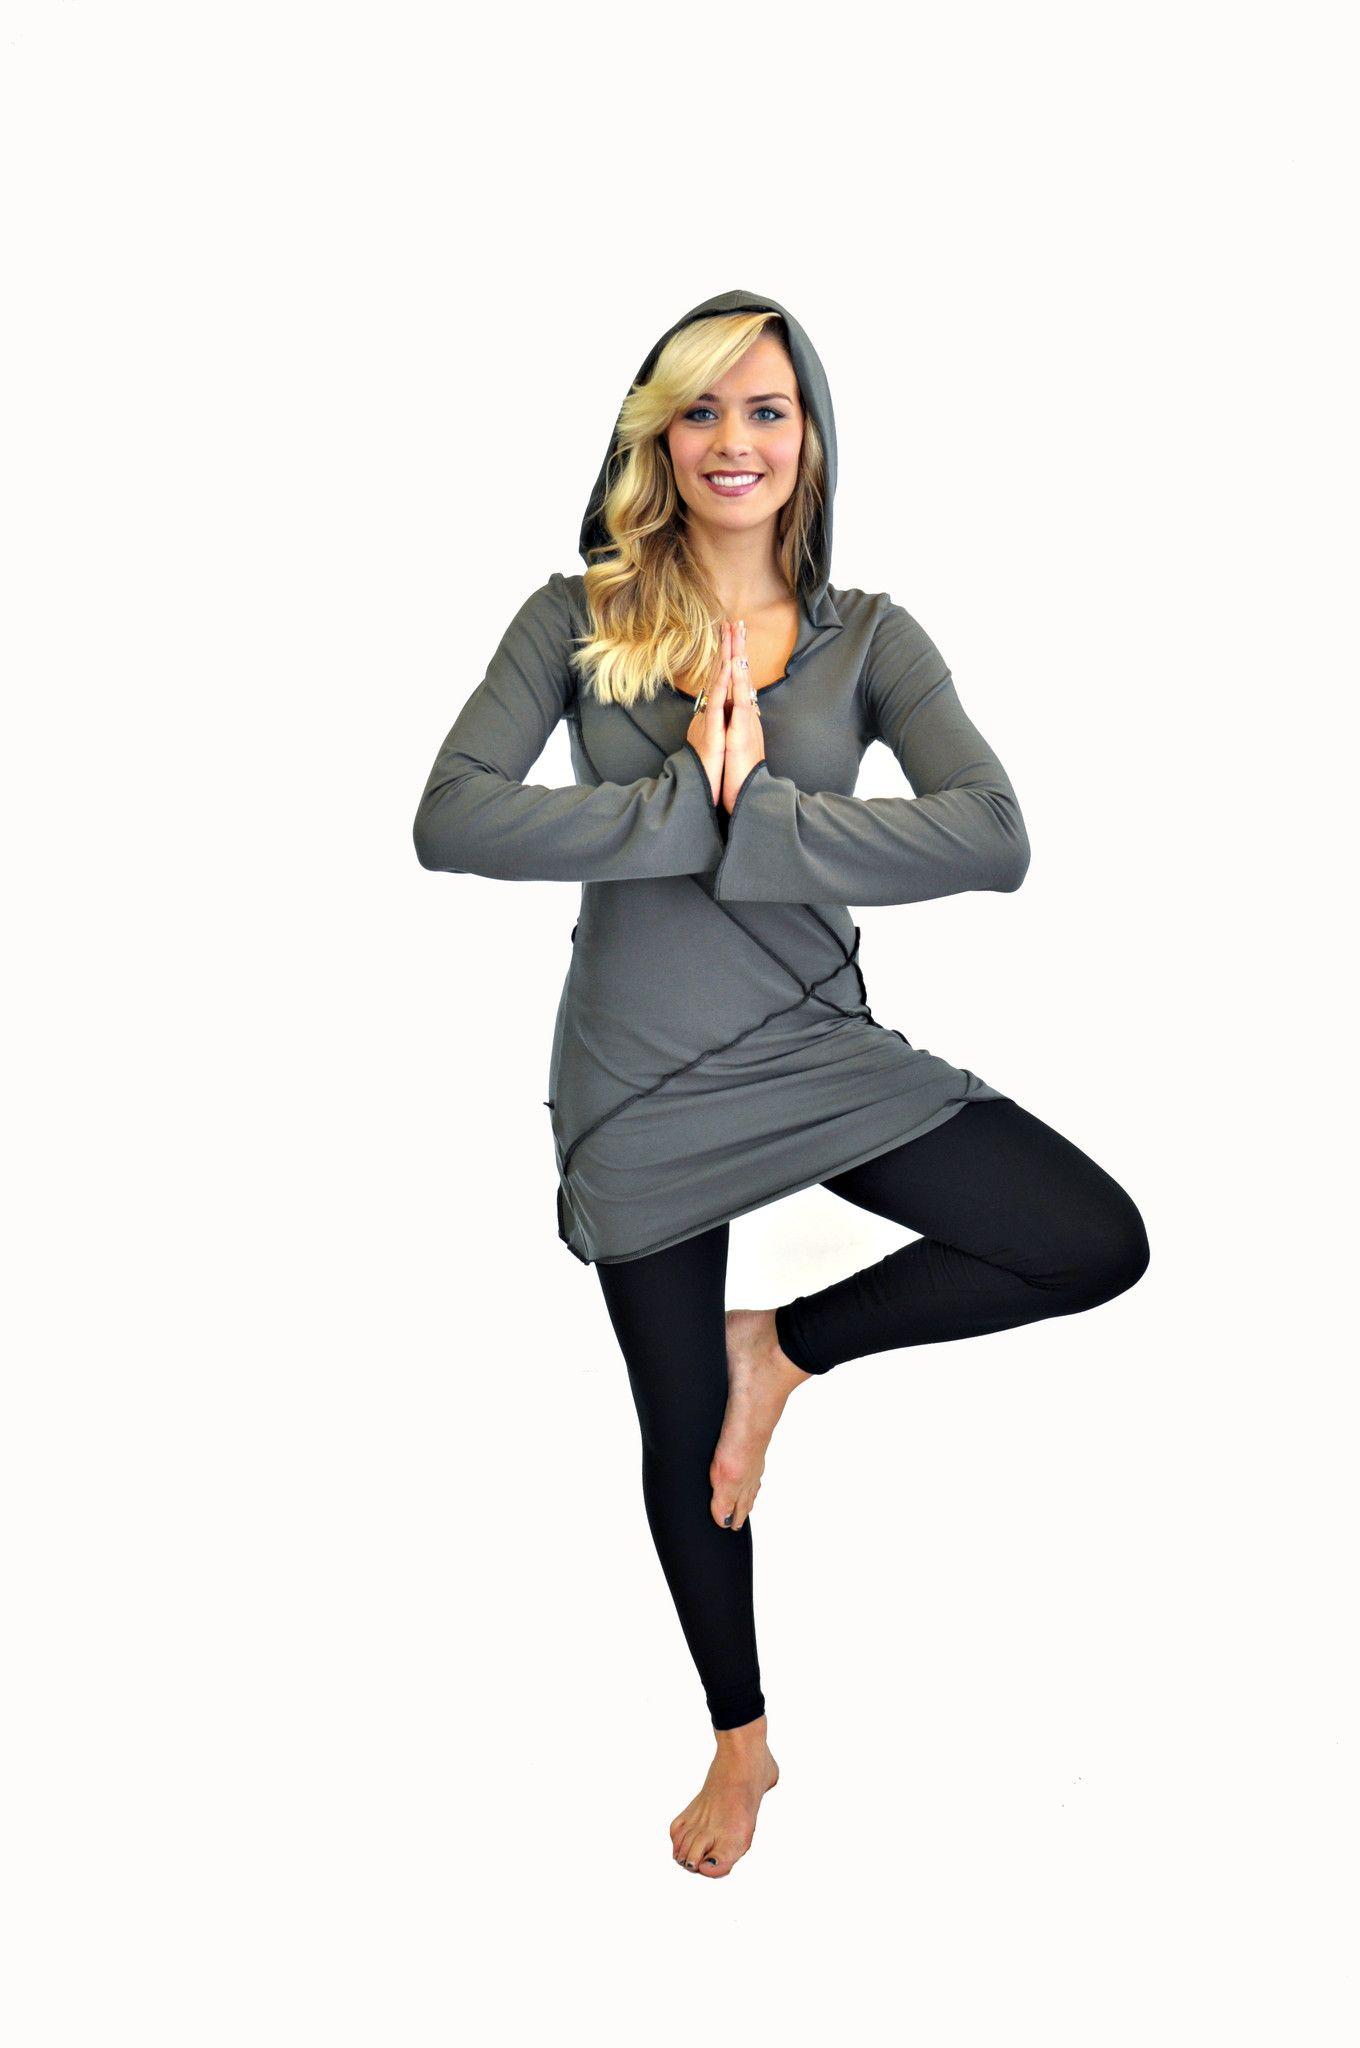 San Francisco Tunic Yoga Wear Organic Cotton Clothes Fashion We Fashion